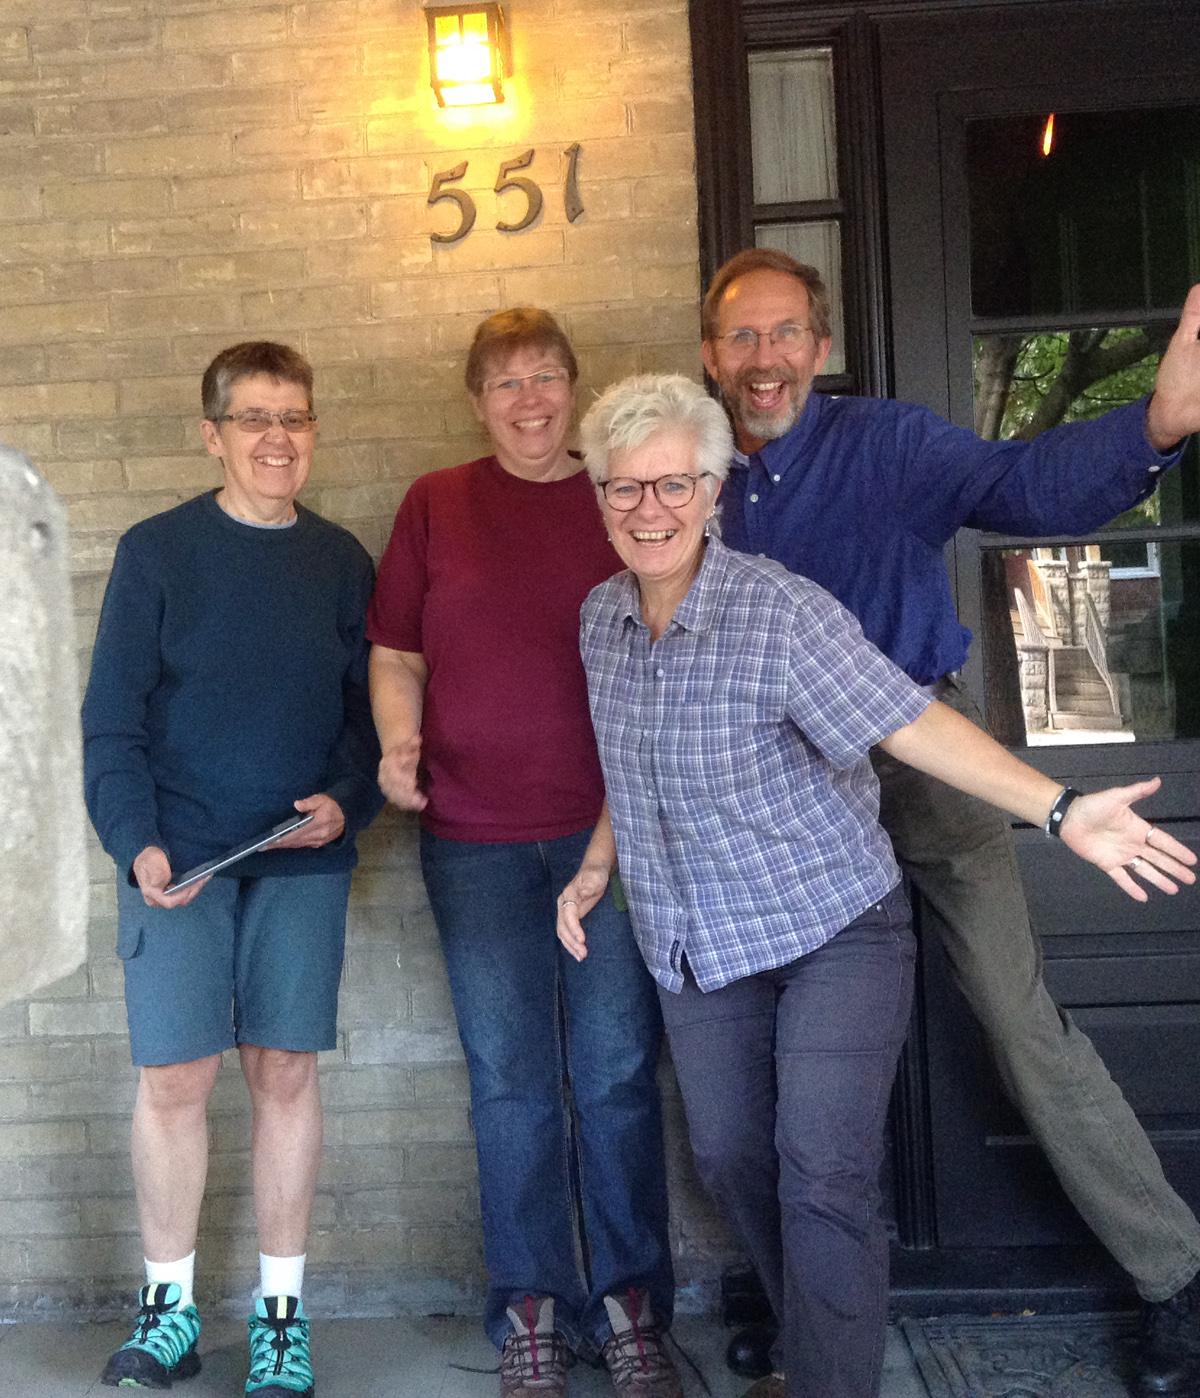 Ann, Jackie, Lynn, and Hubert at Bedford House